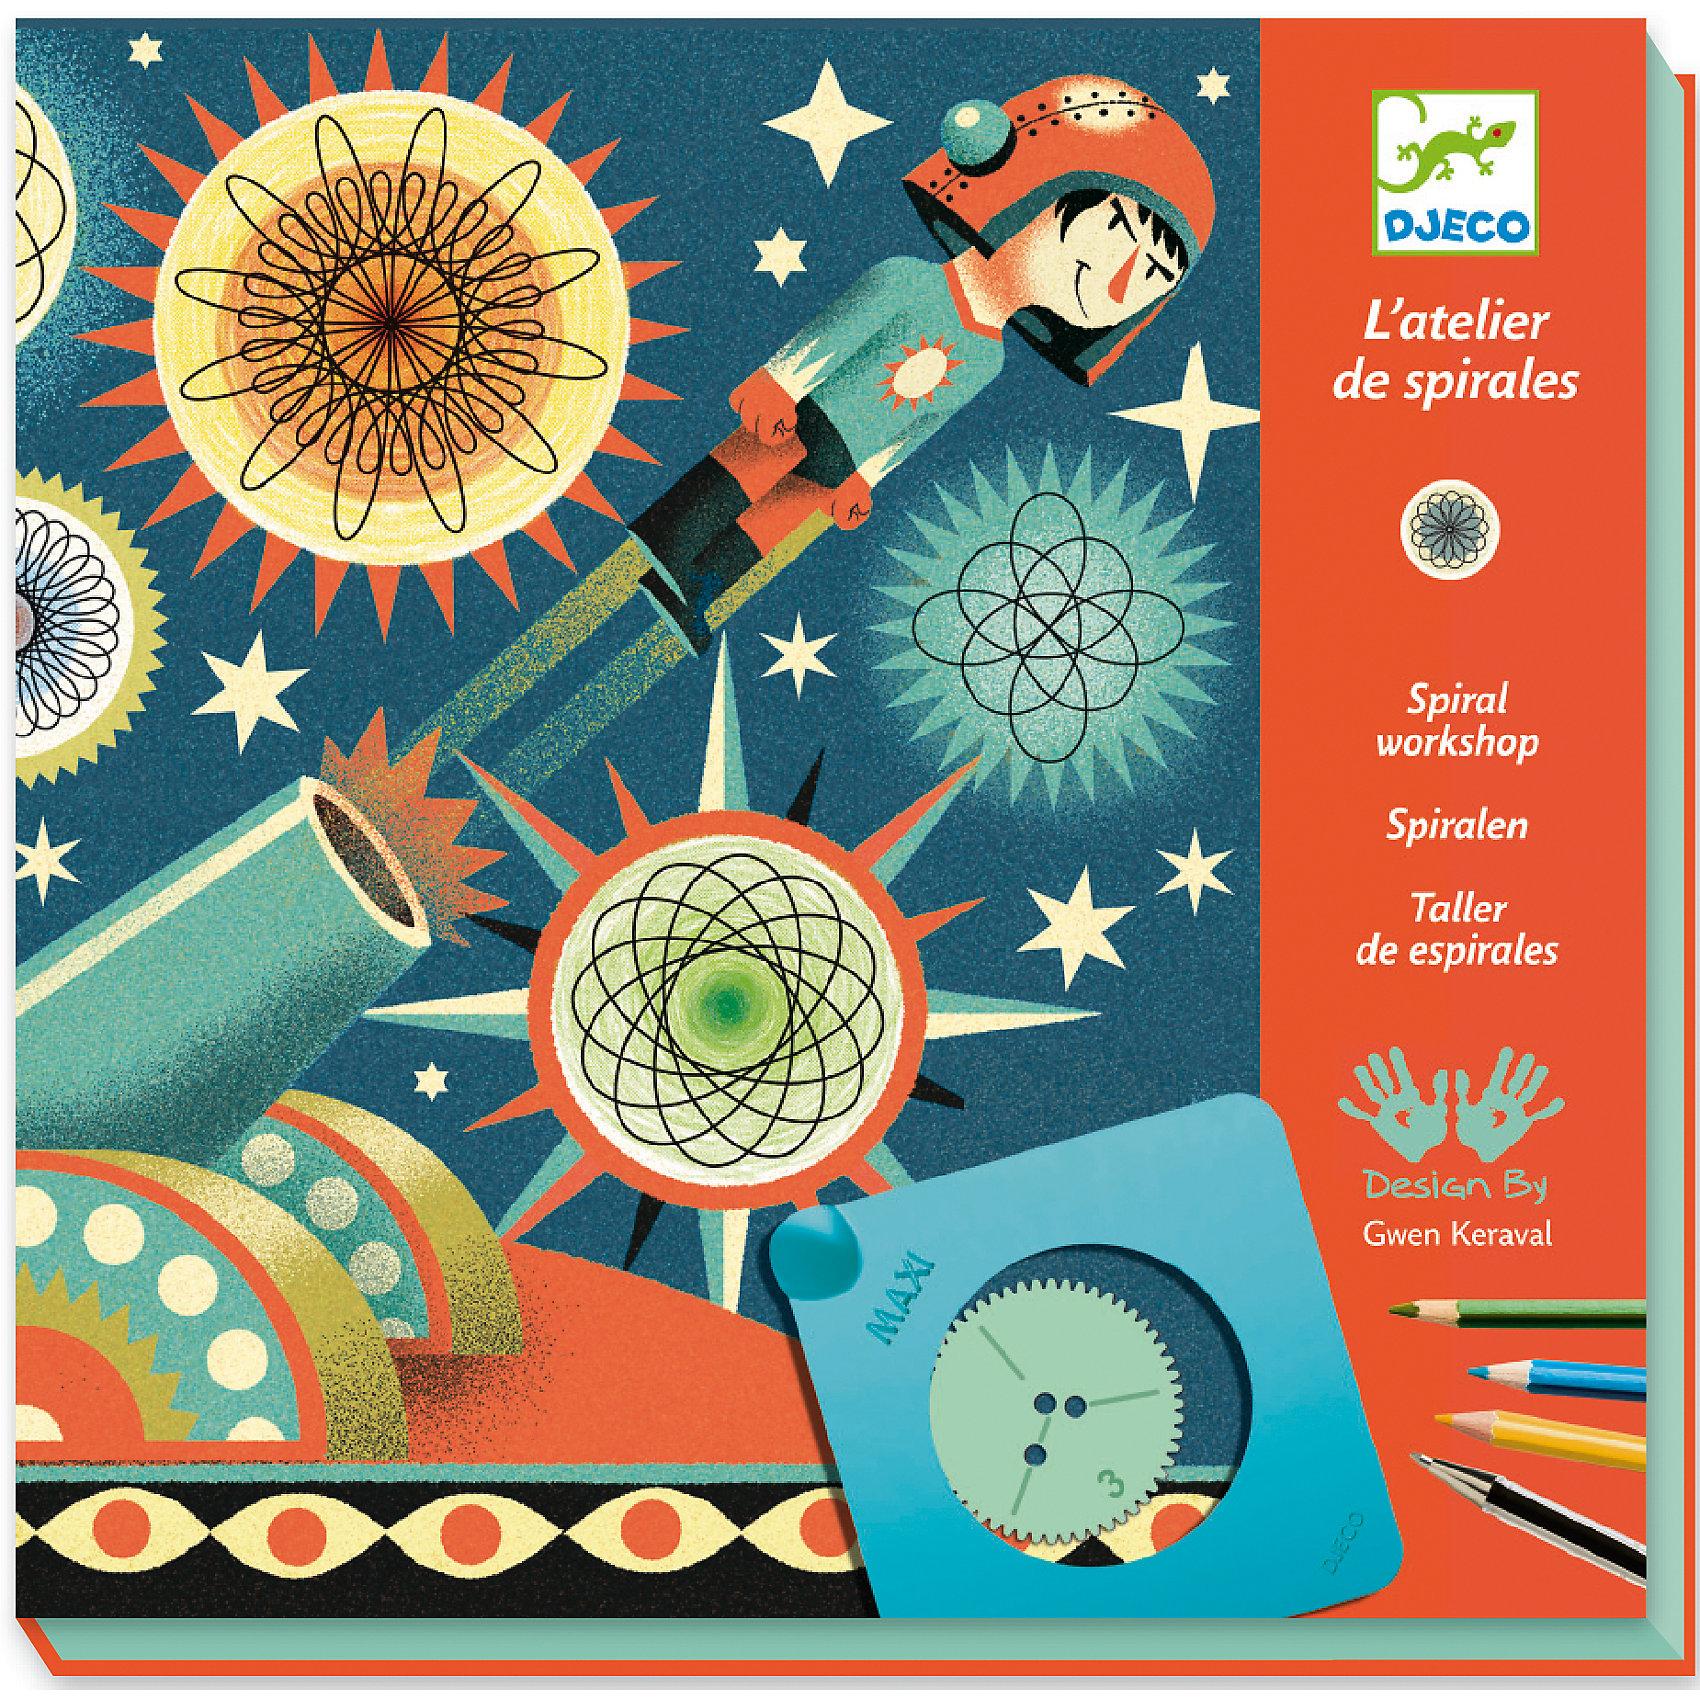 DJECO Творческий набор-игра для рисования Спирали Космос наборы для рисования djeco набор для творчества египетское искусство